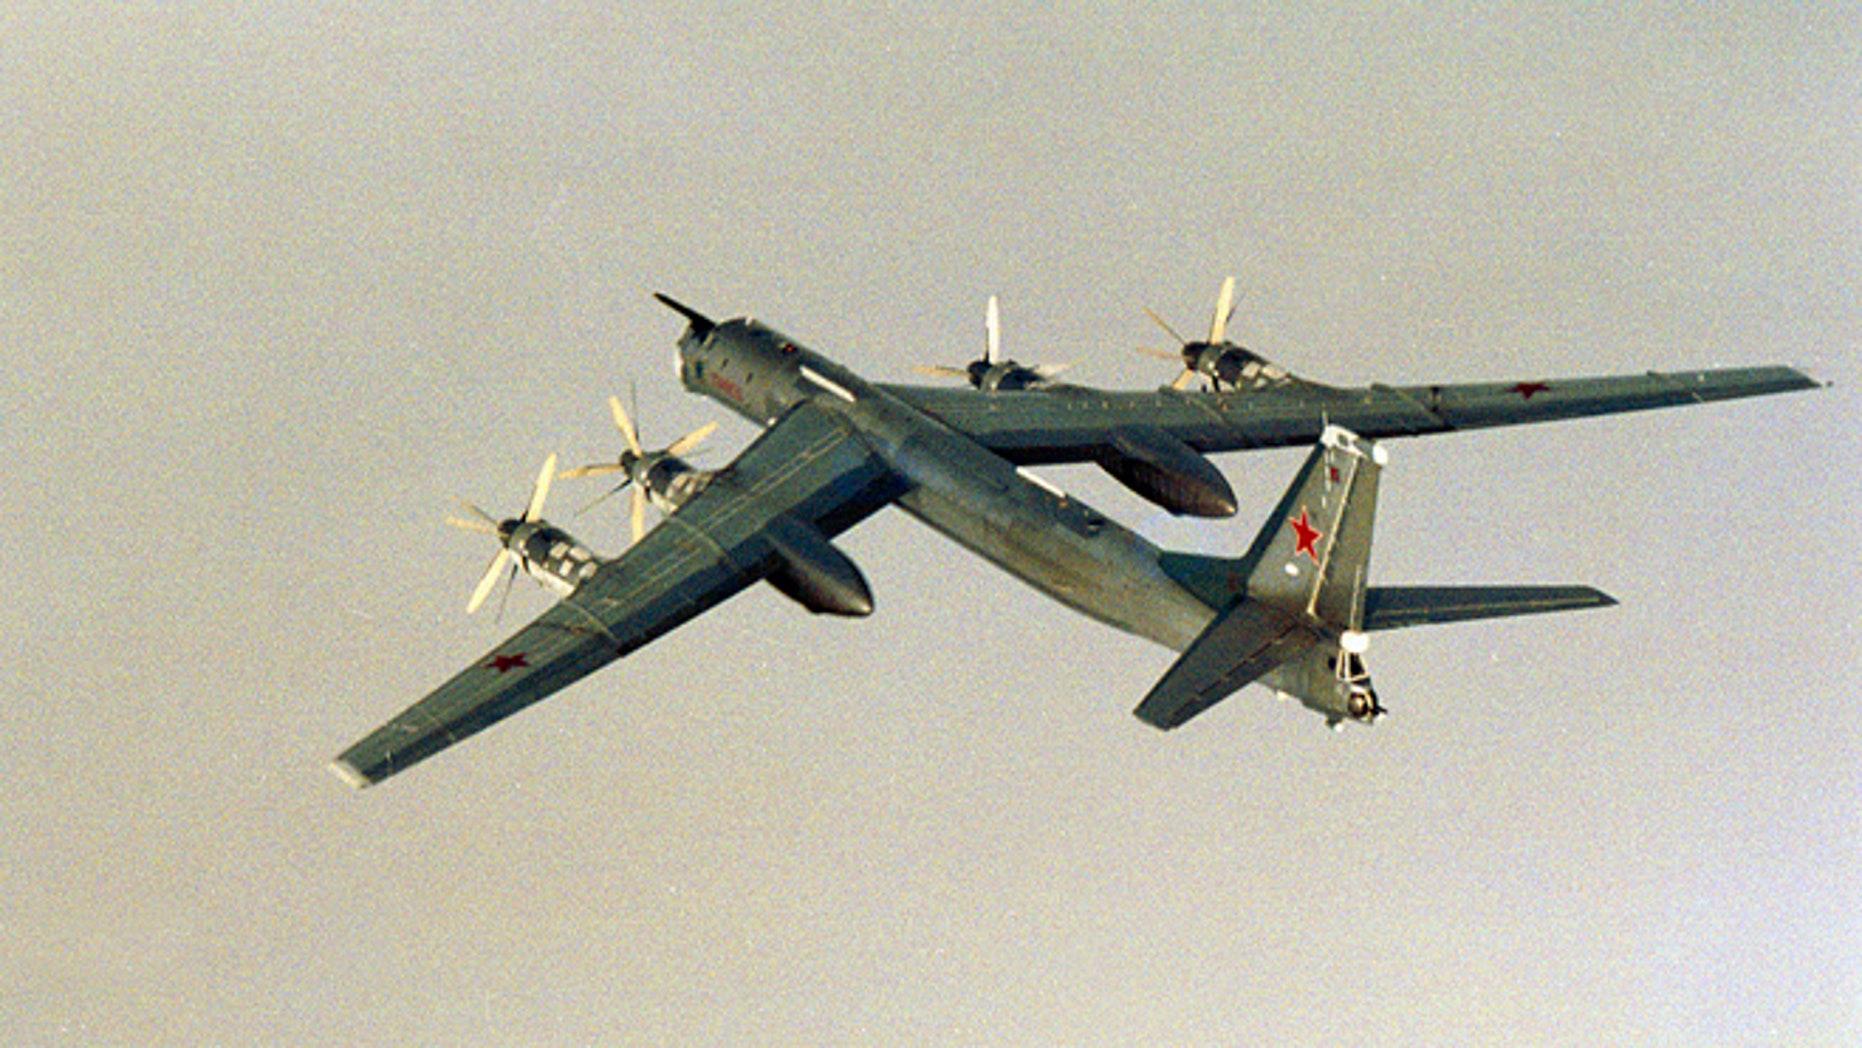 A Russian Tu-95 bomber.